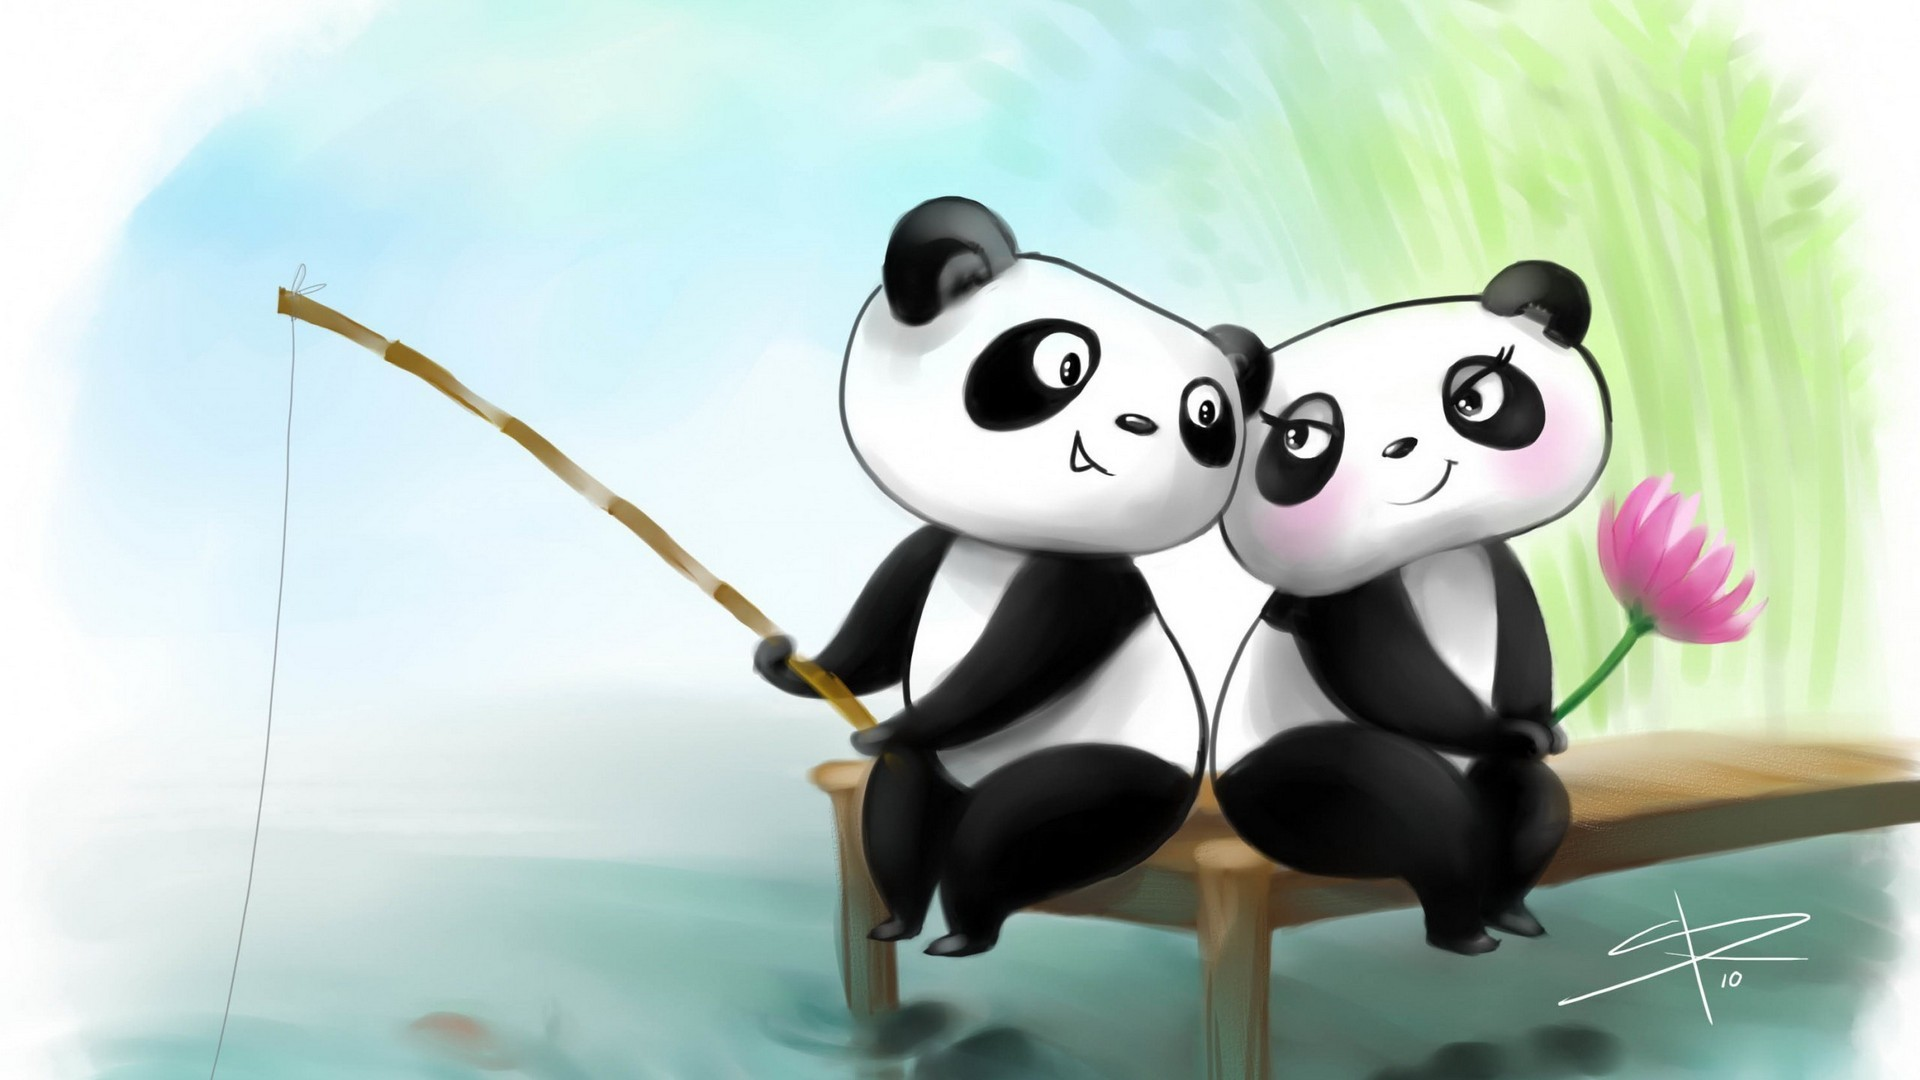 Res: 1920x1080, Cute Couple Panda Wallpaper